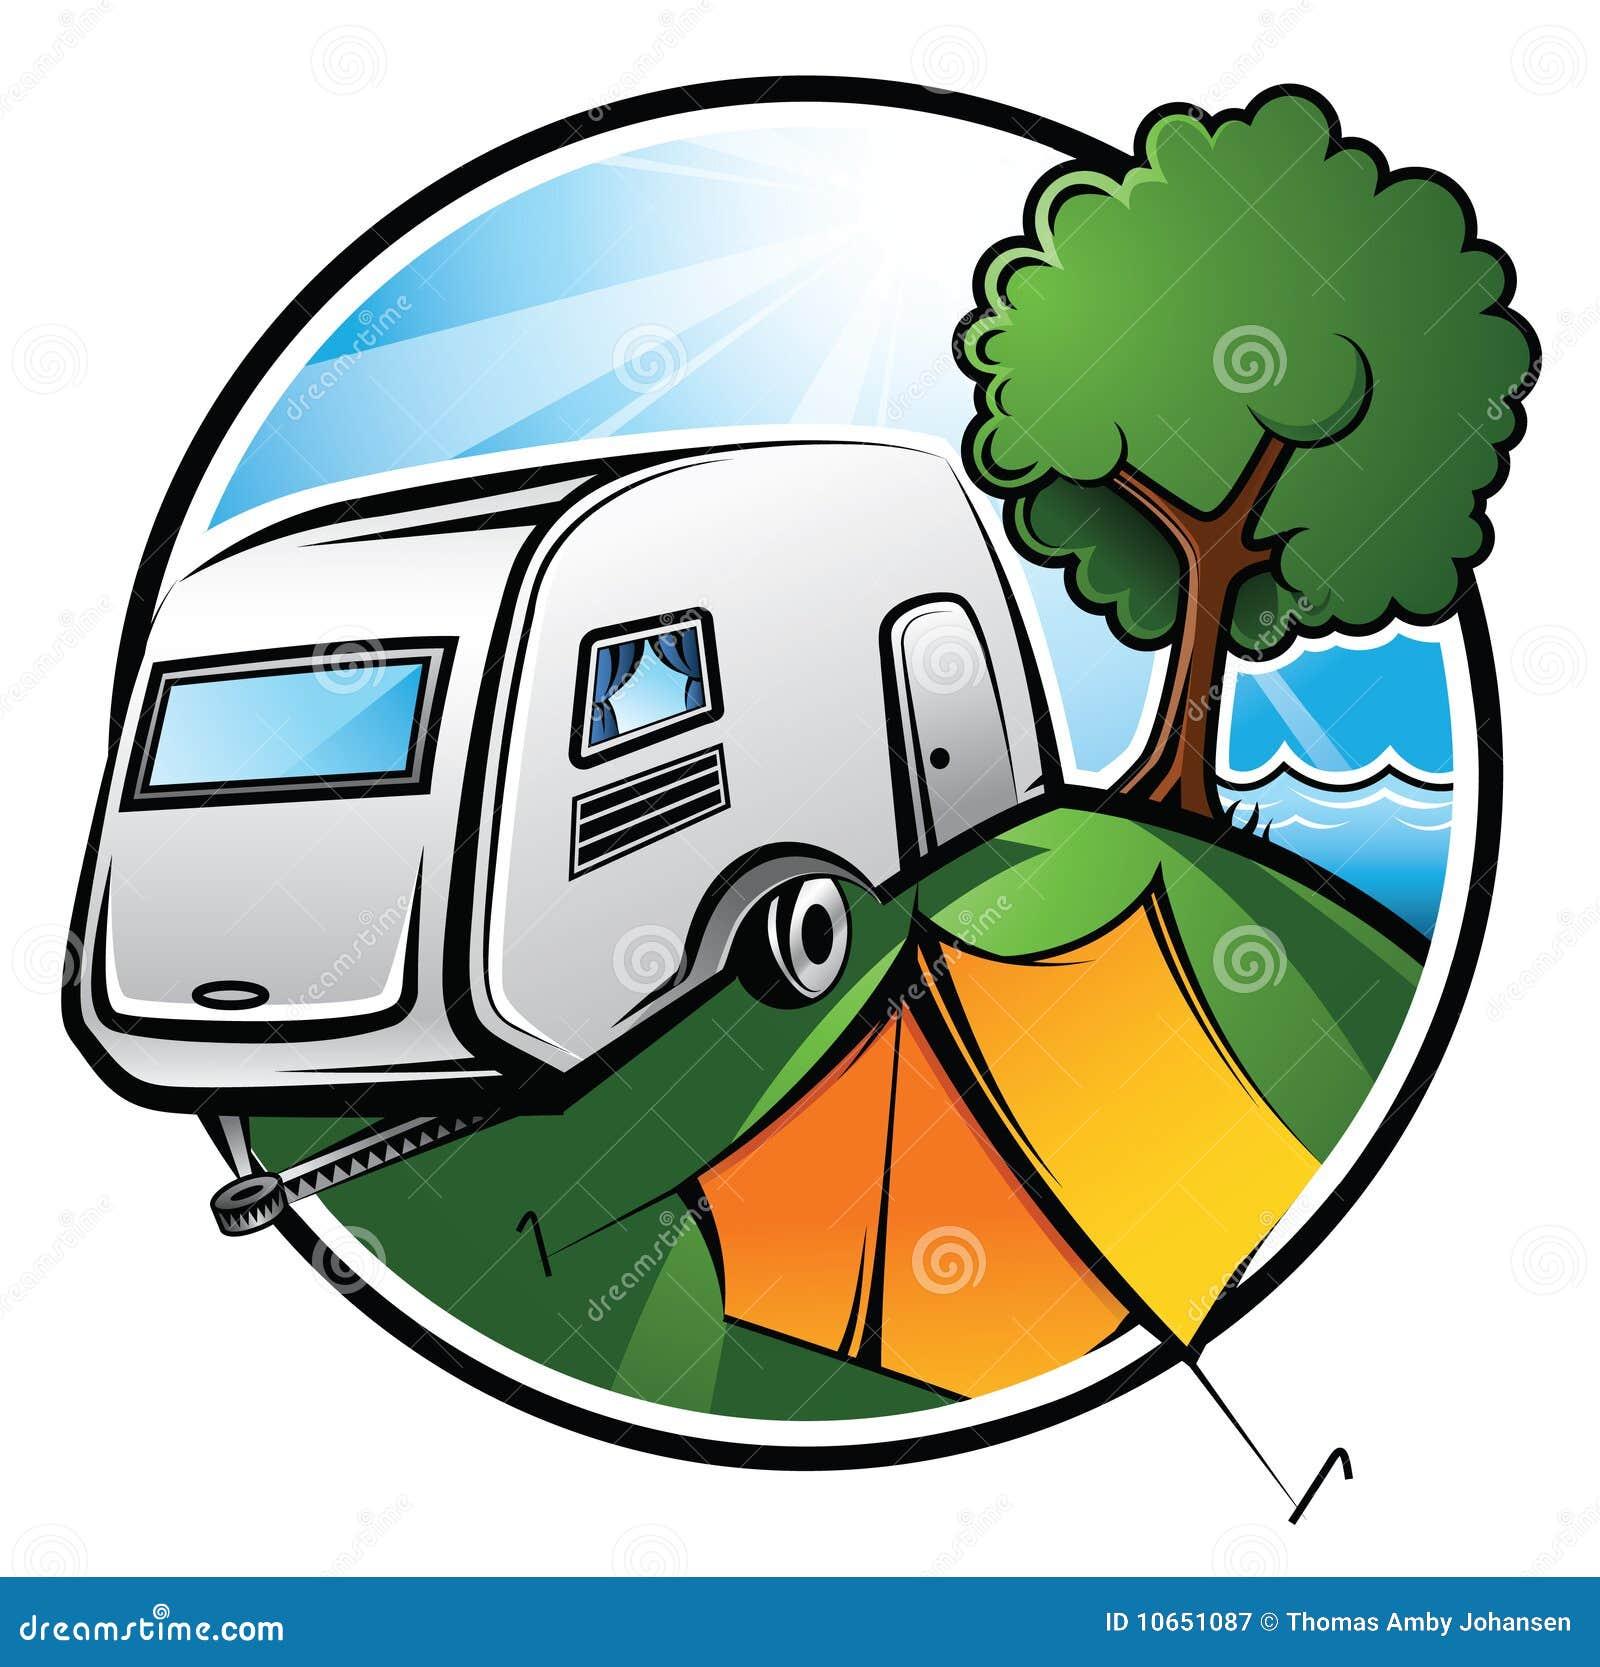 Campground map design software free fiemasra198513 for Map designer free